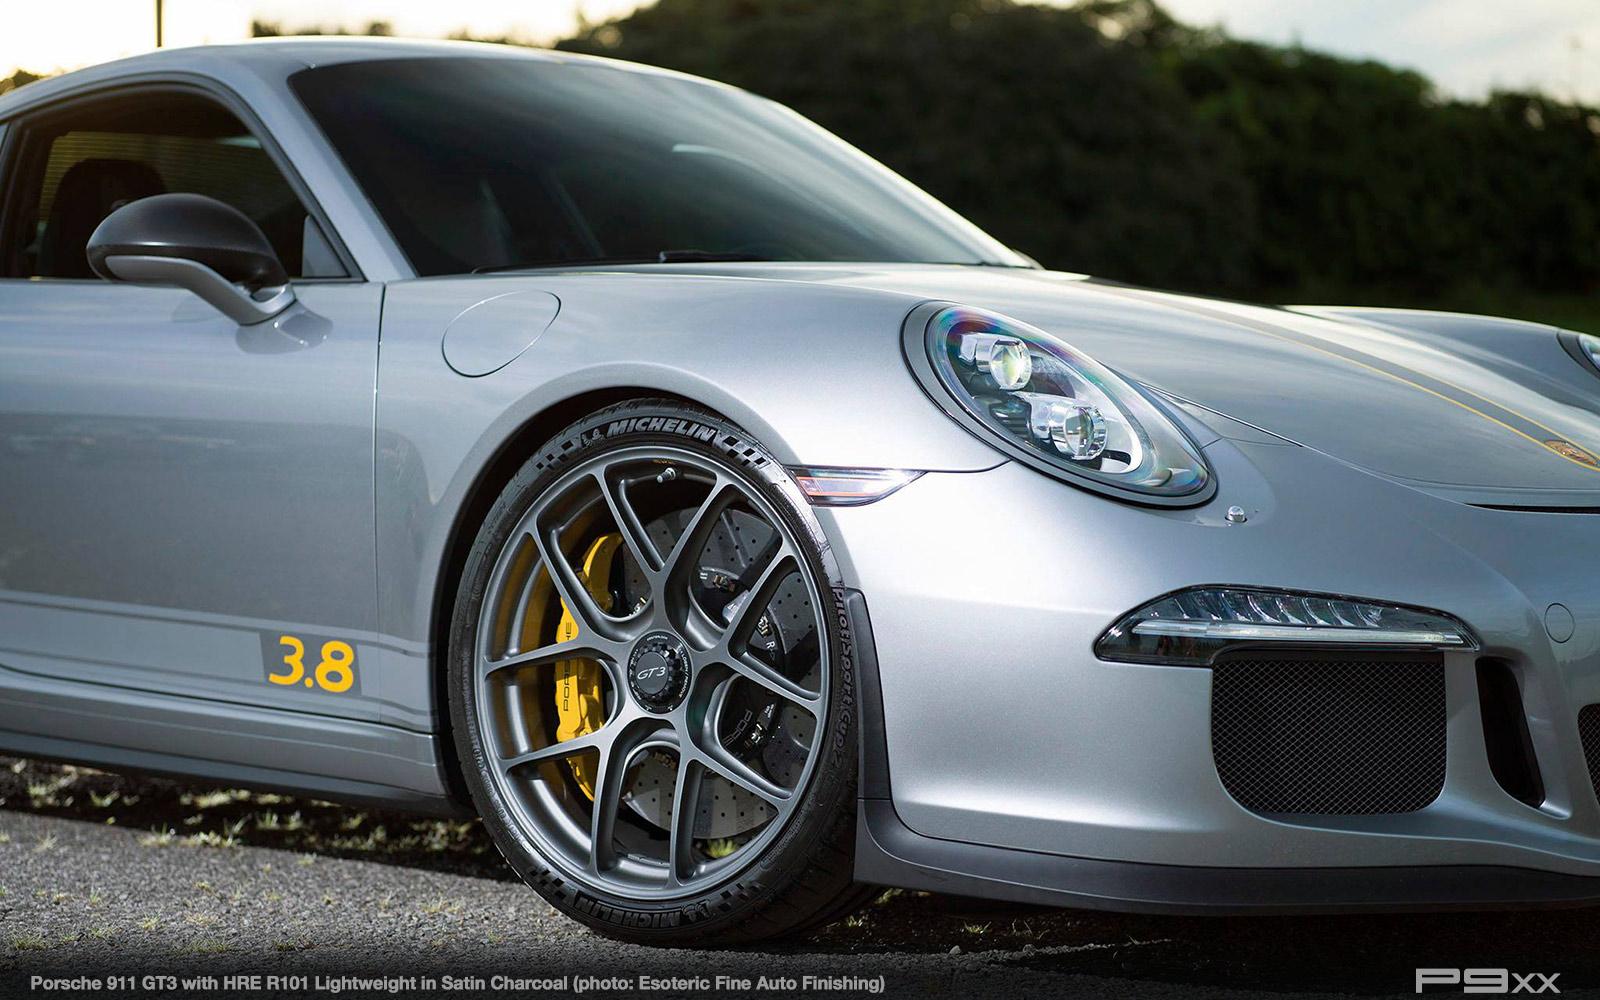 Porsche-911-GT3-Esoteric-HRE-R101-482